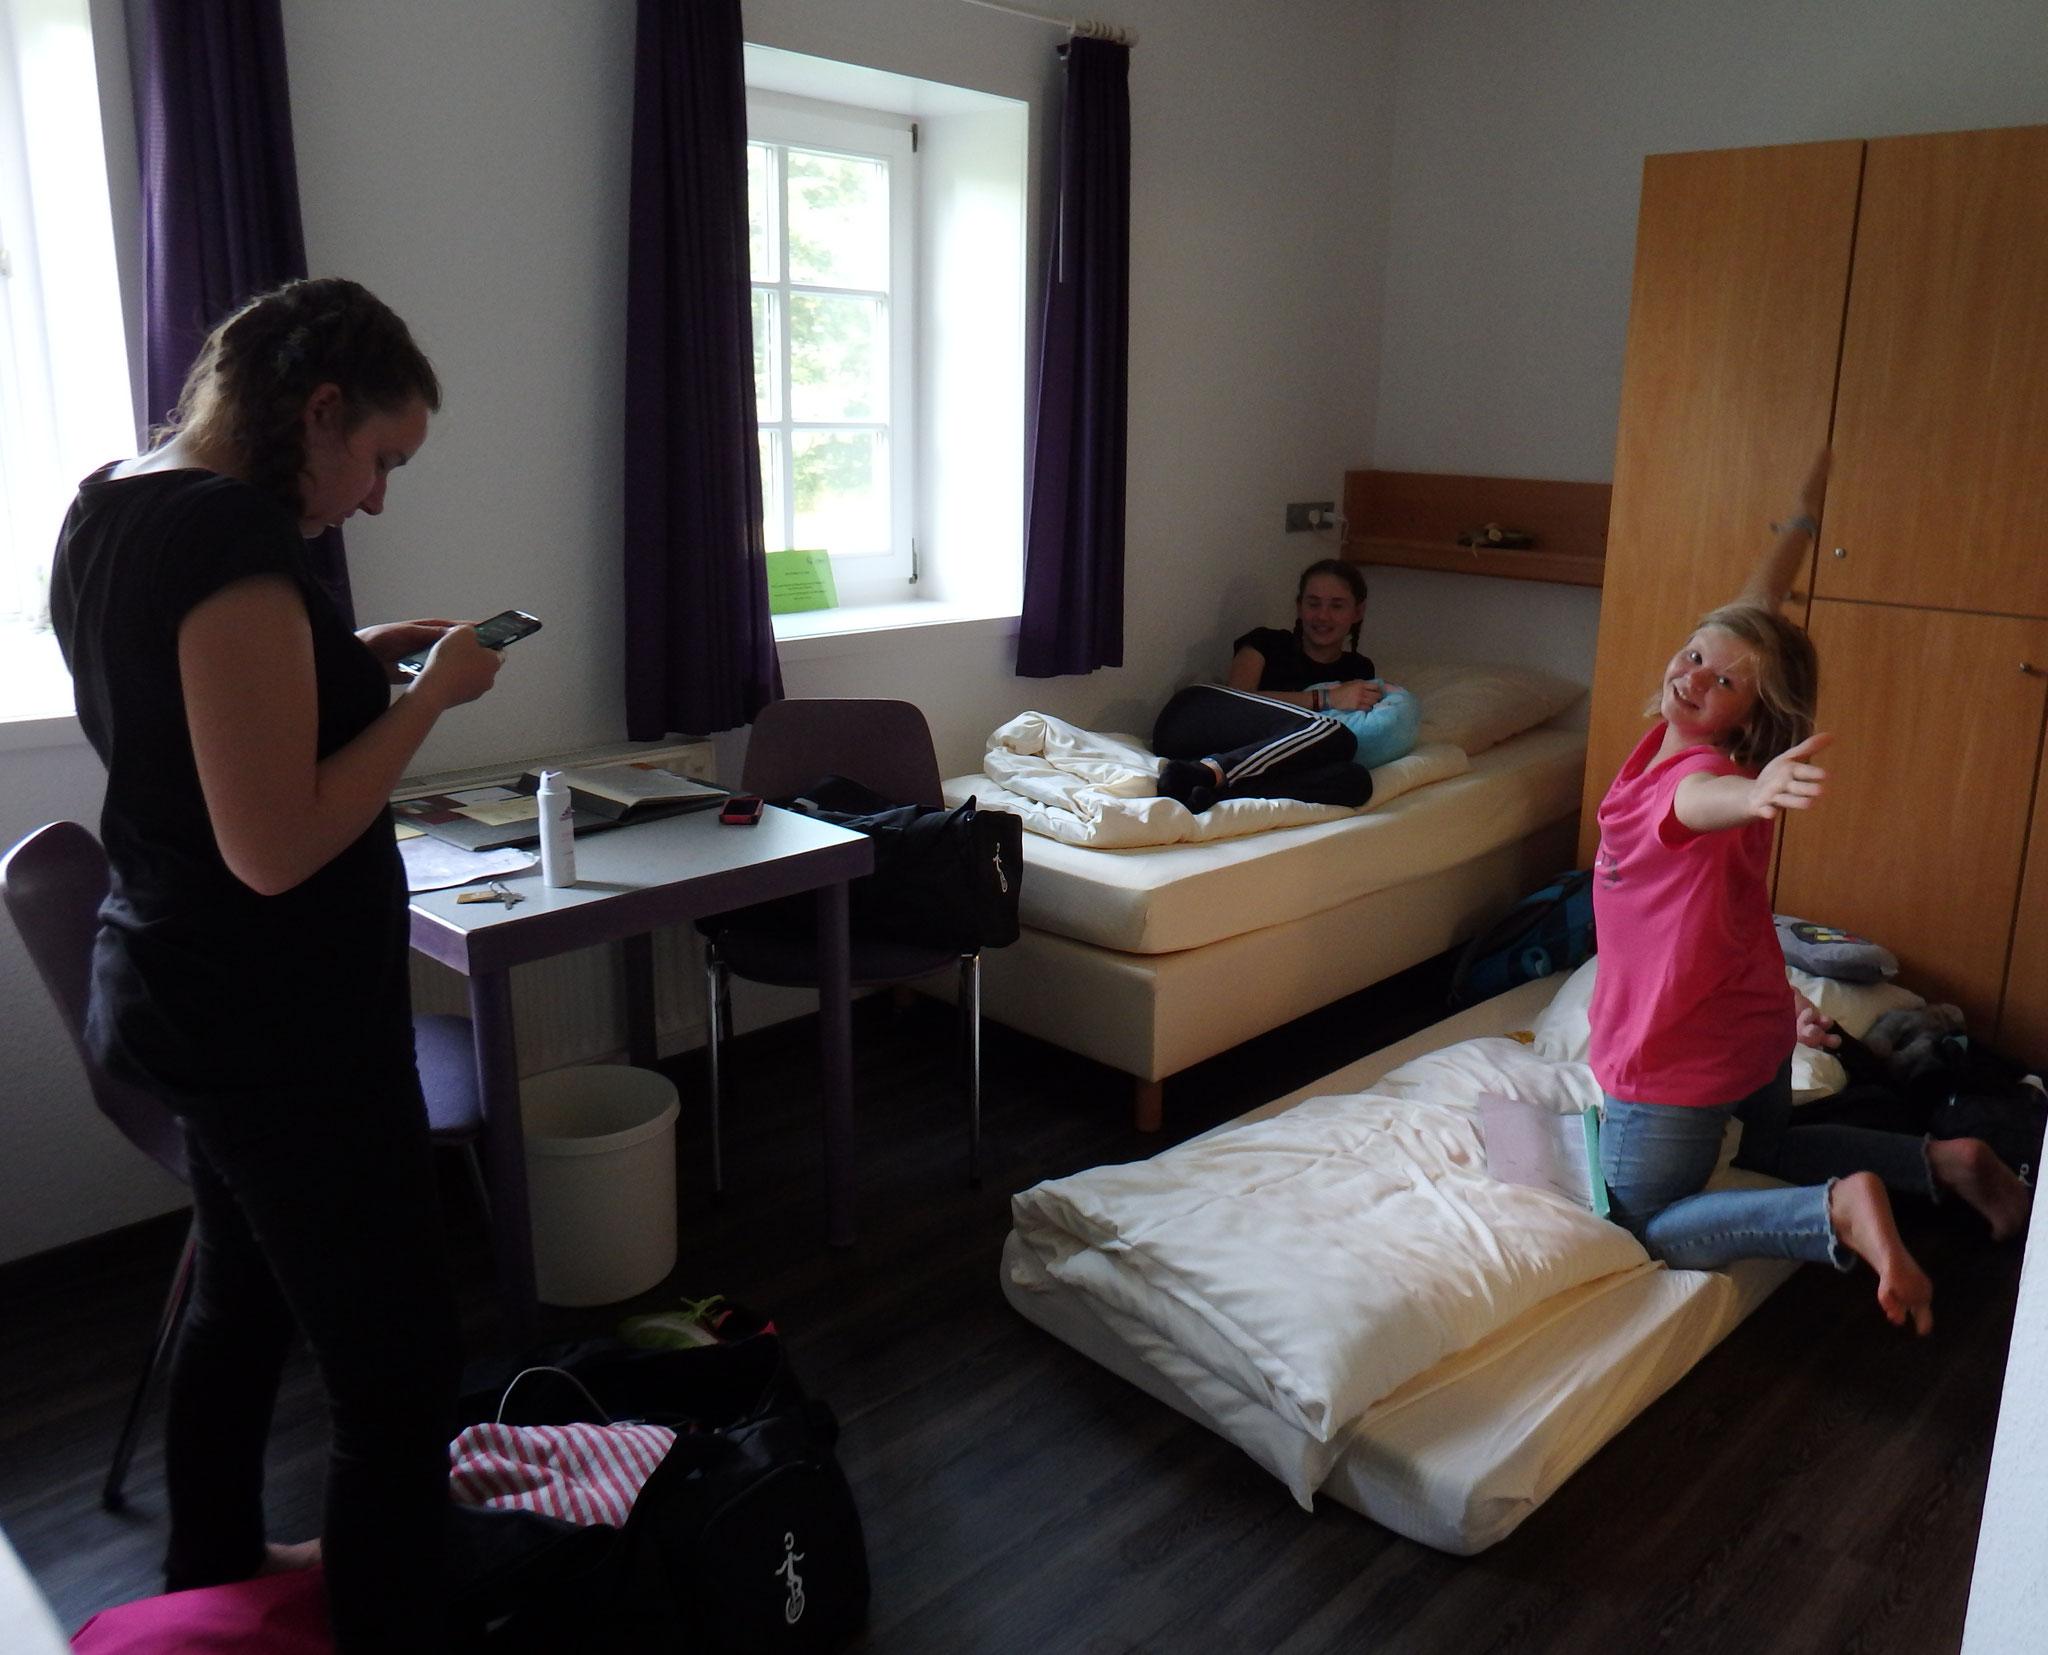 Zimmer 1 (Julia, Katharina und Finja)